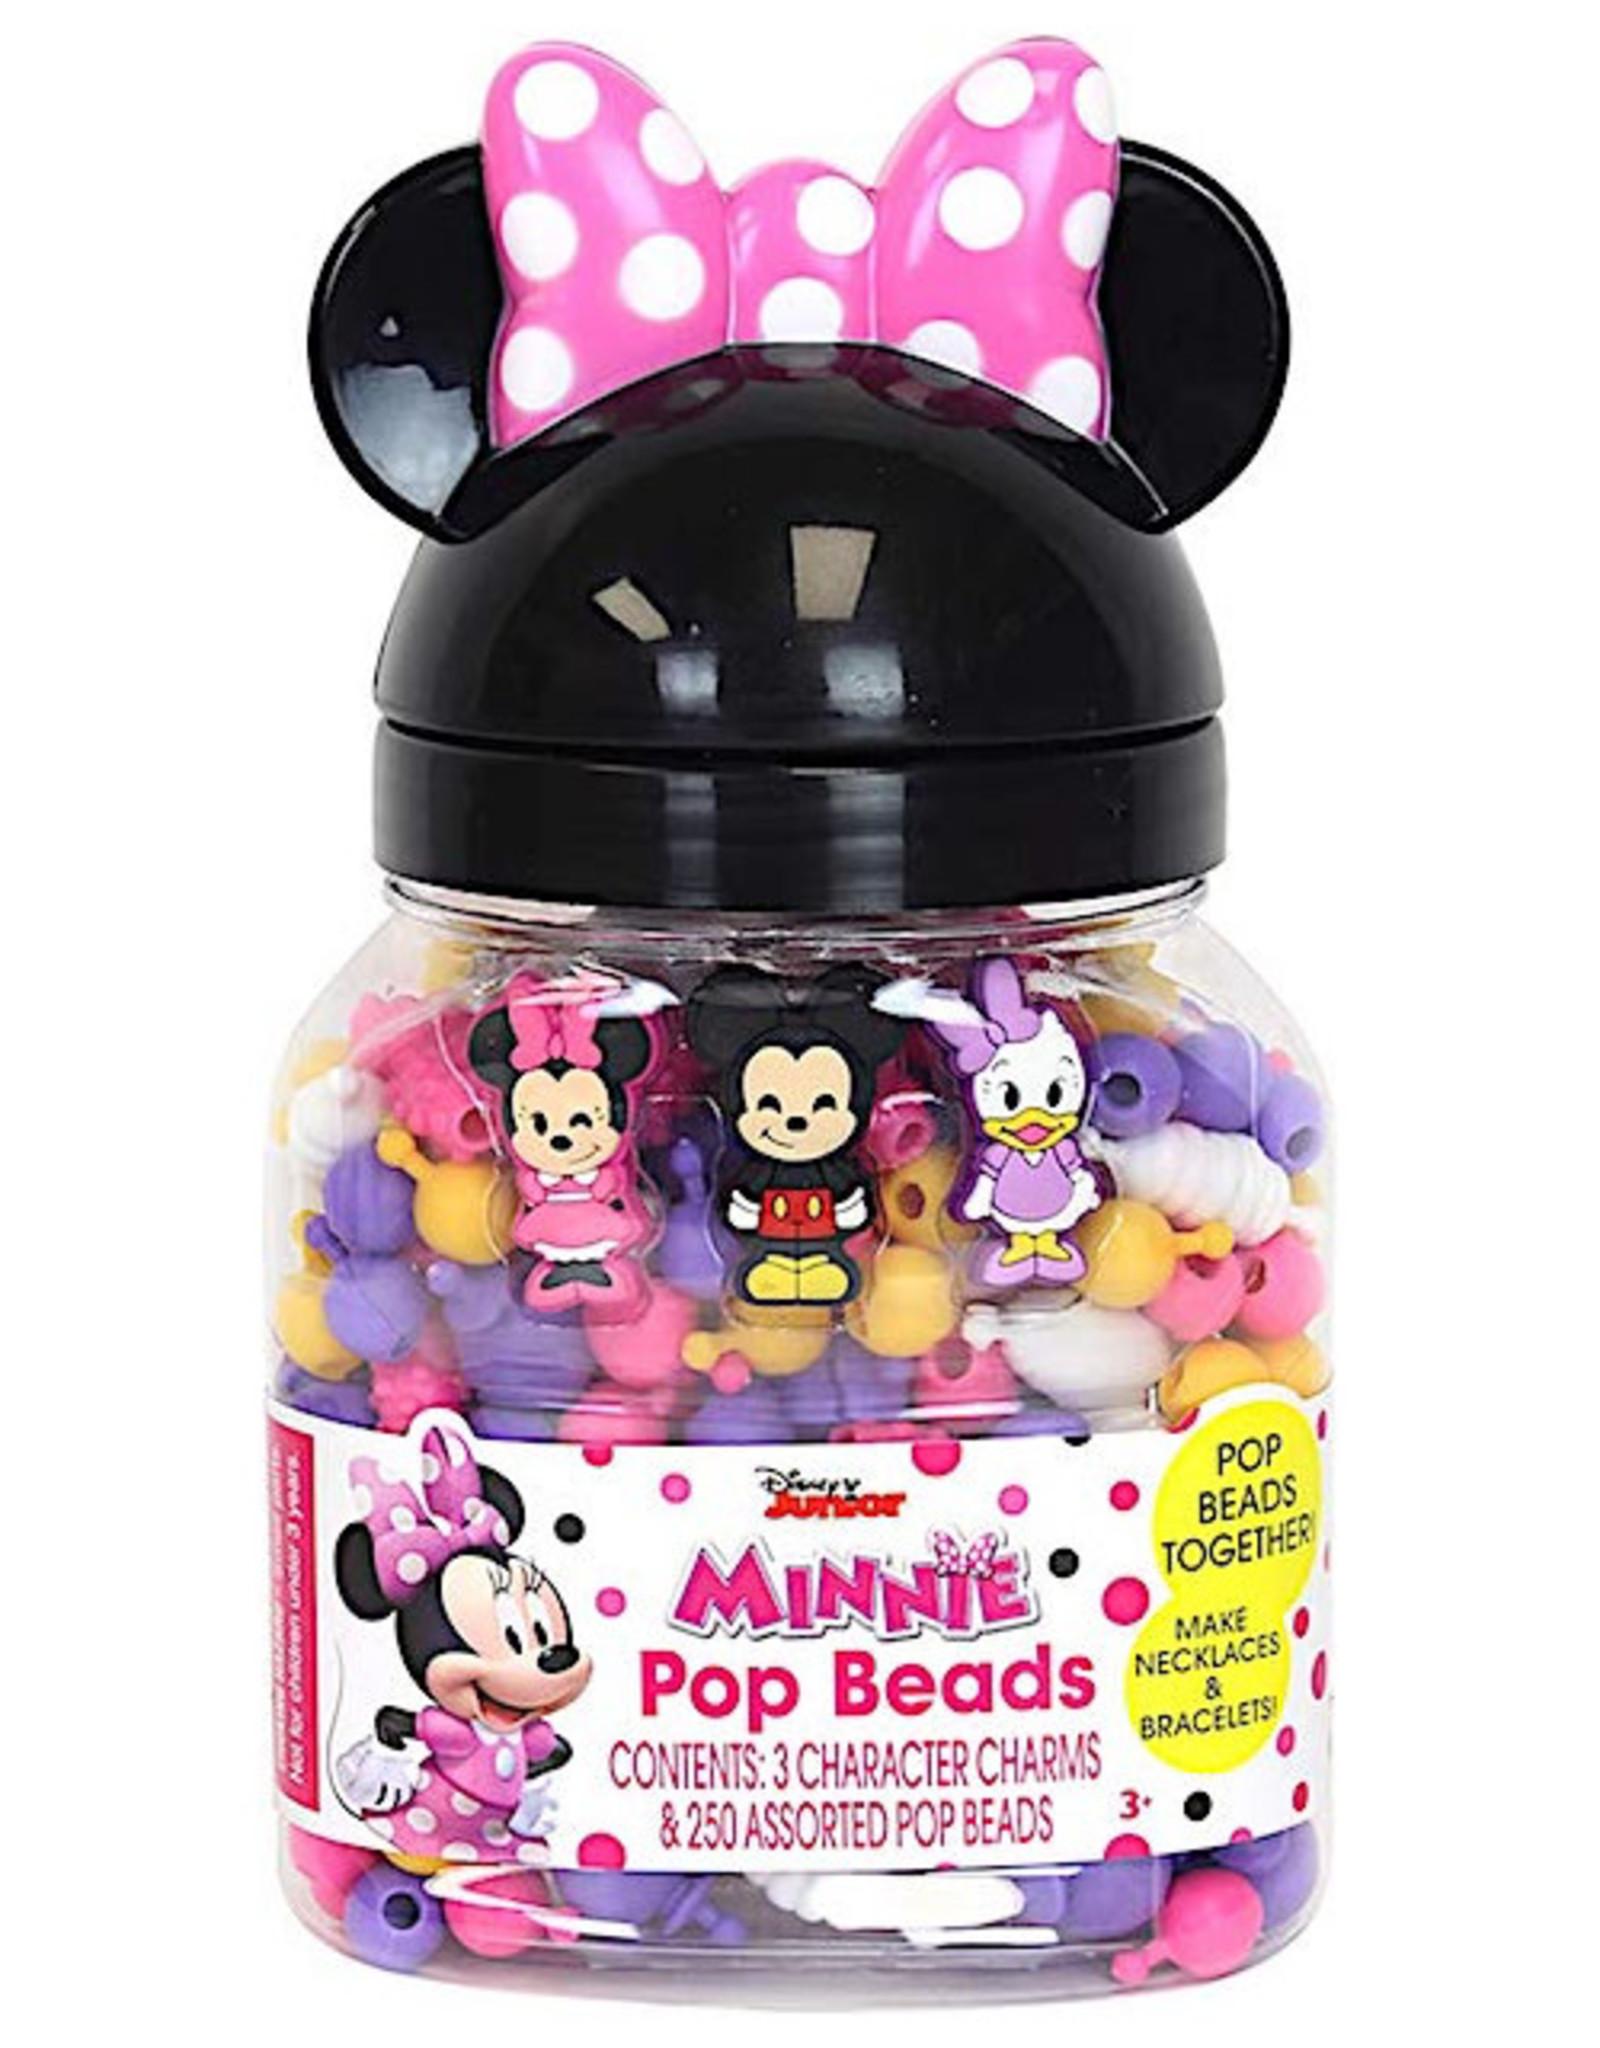 Tara Toys Minnie Mouse Pop Beads